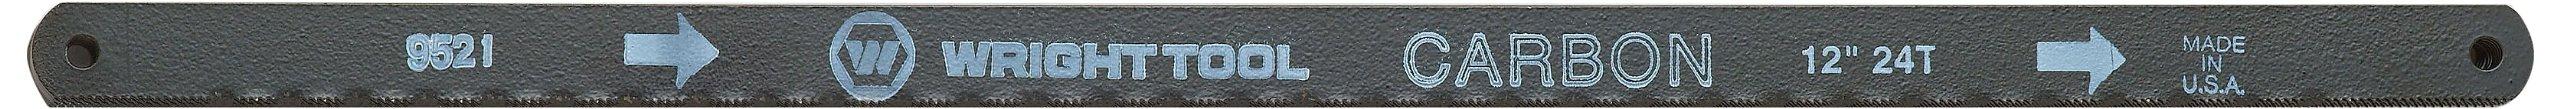 Wright Tool 9521 20/18T 12-Inch Bi-Metal Hacksaw Blade